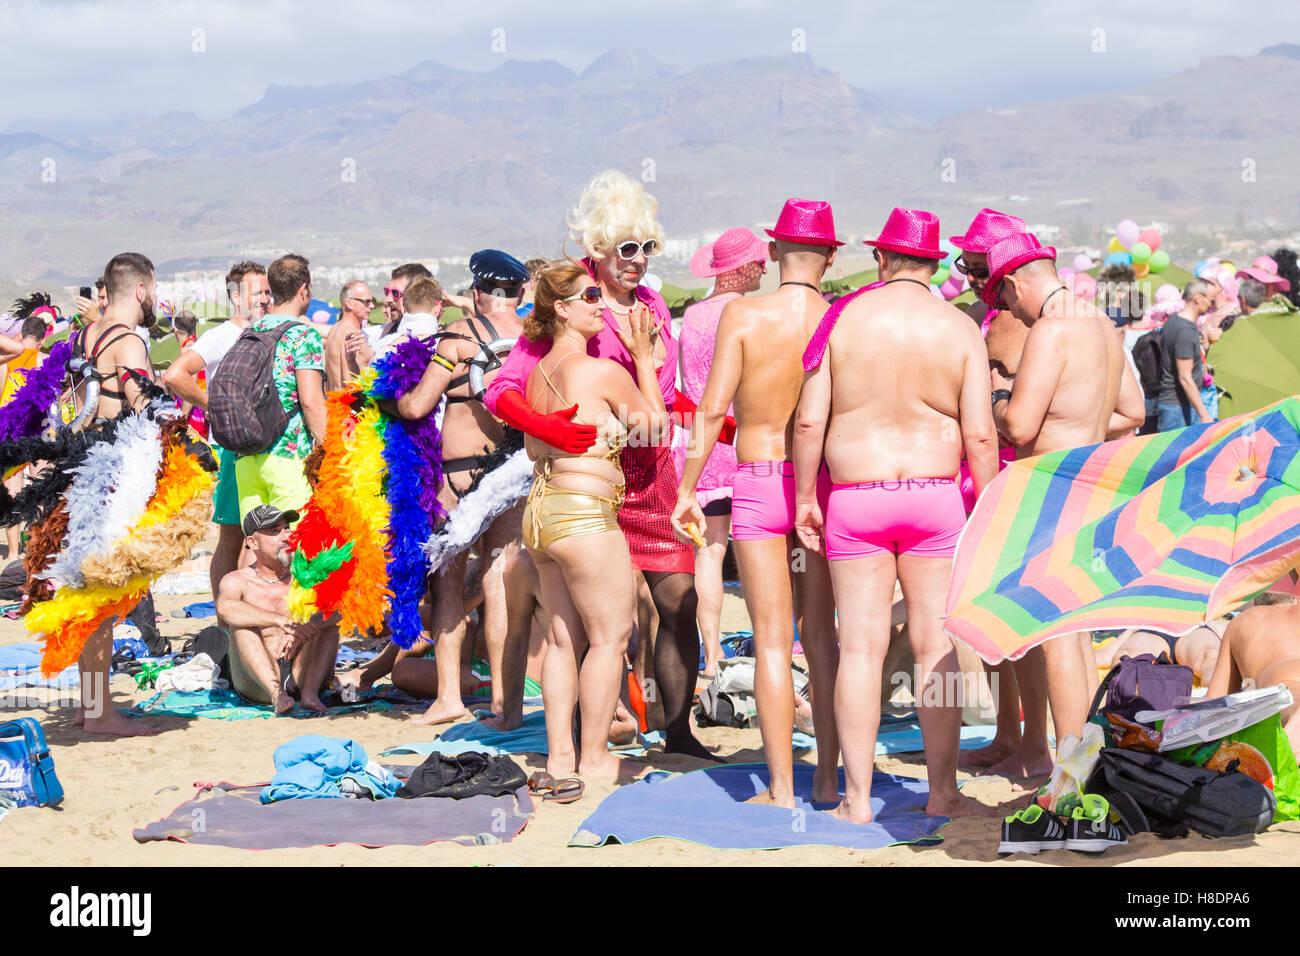 Fkk pics gay Fkk nudist